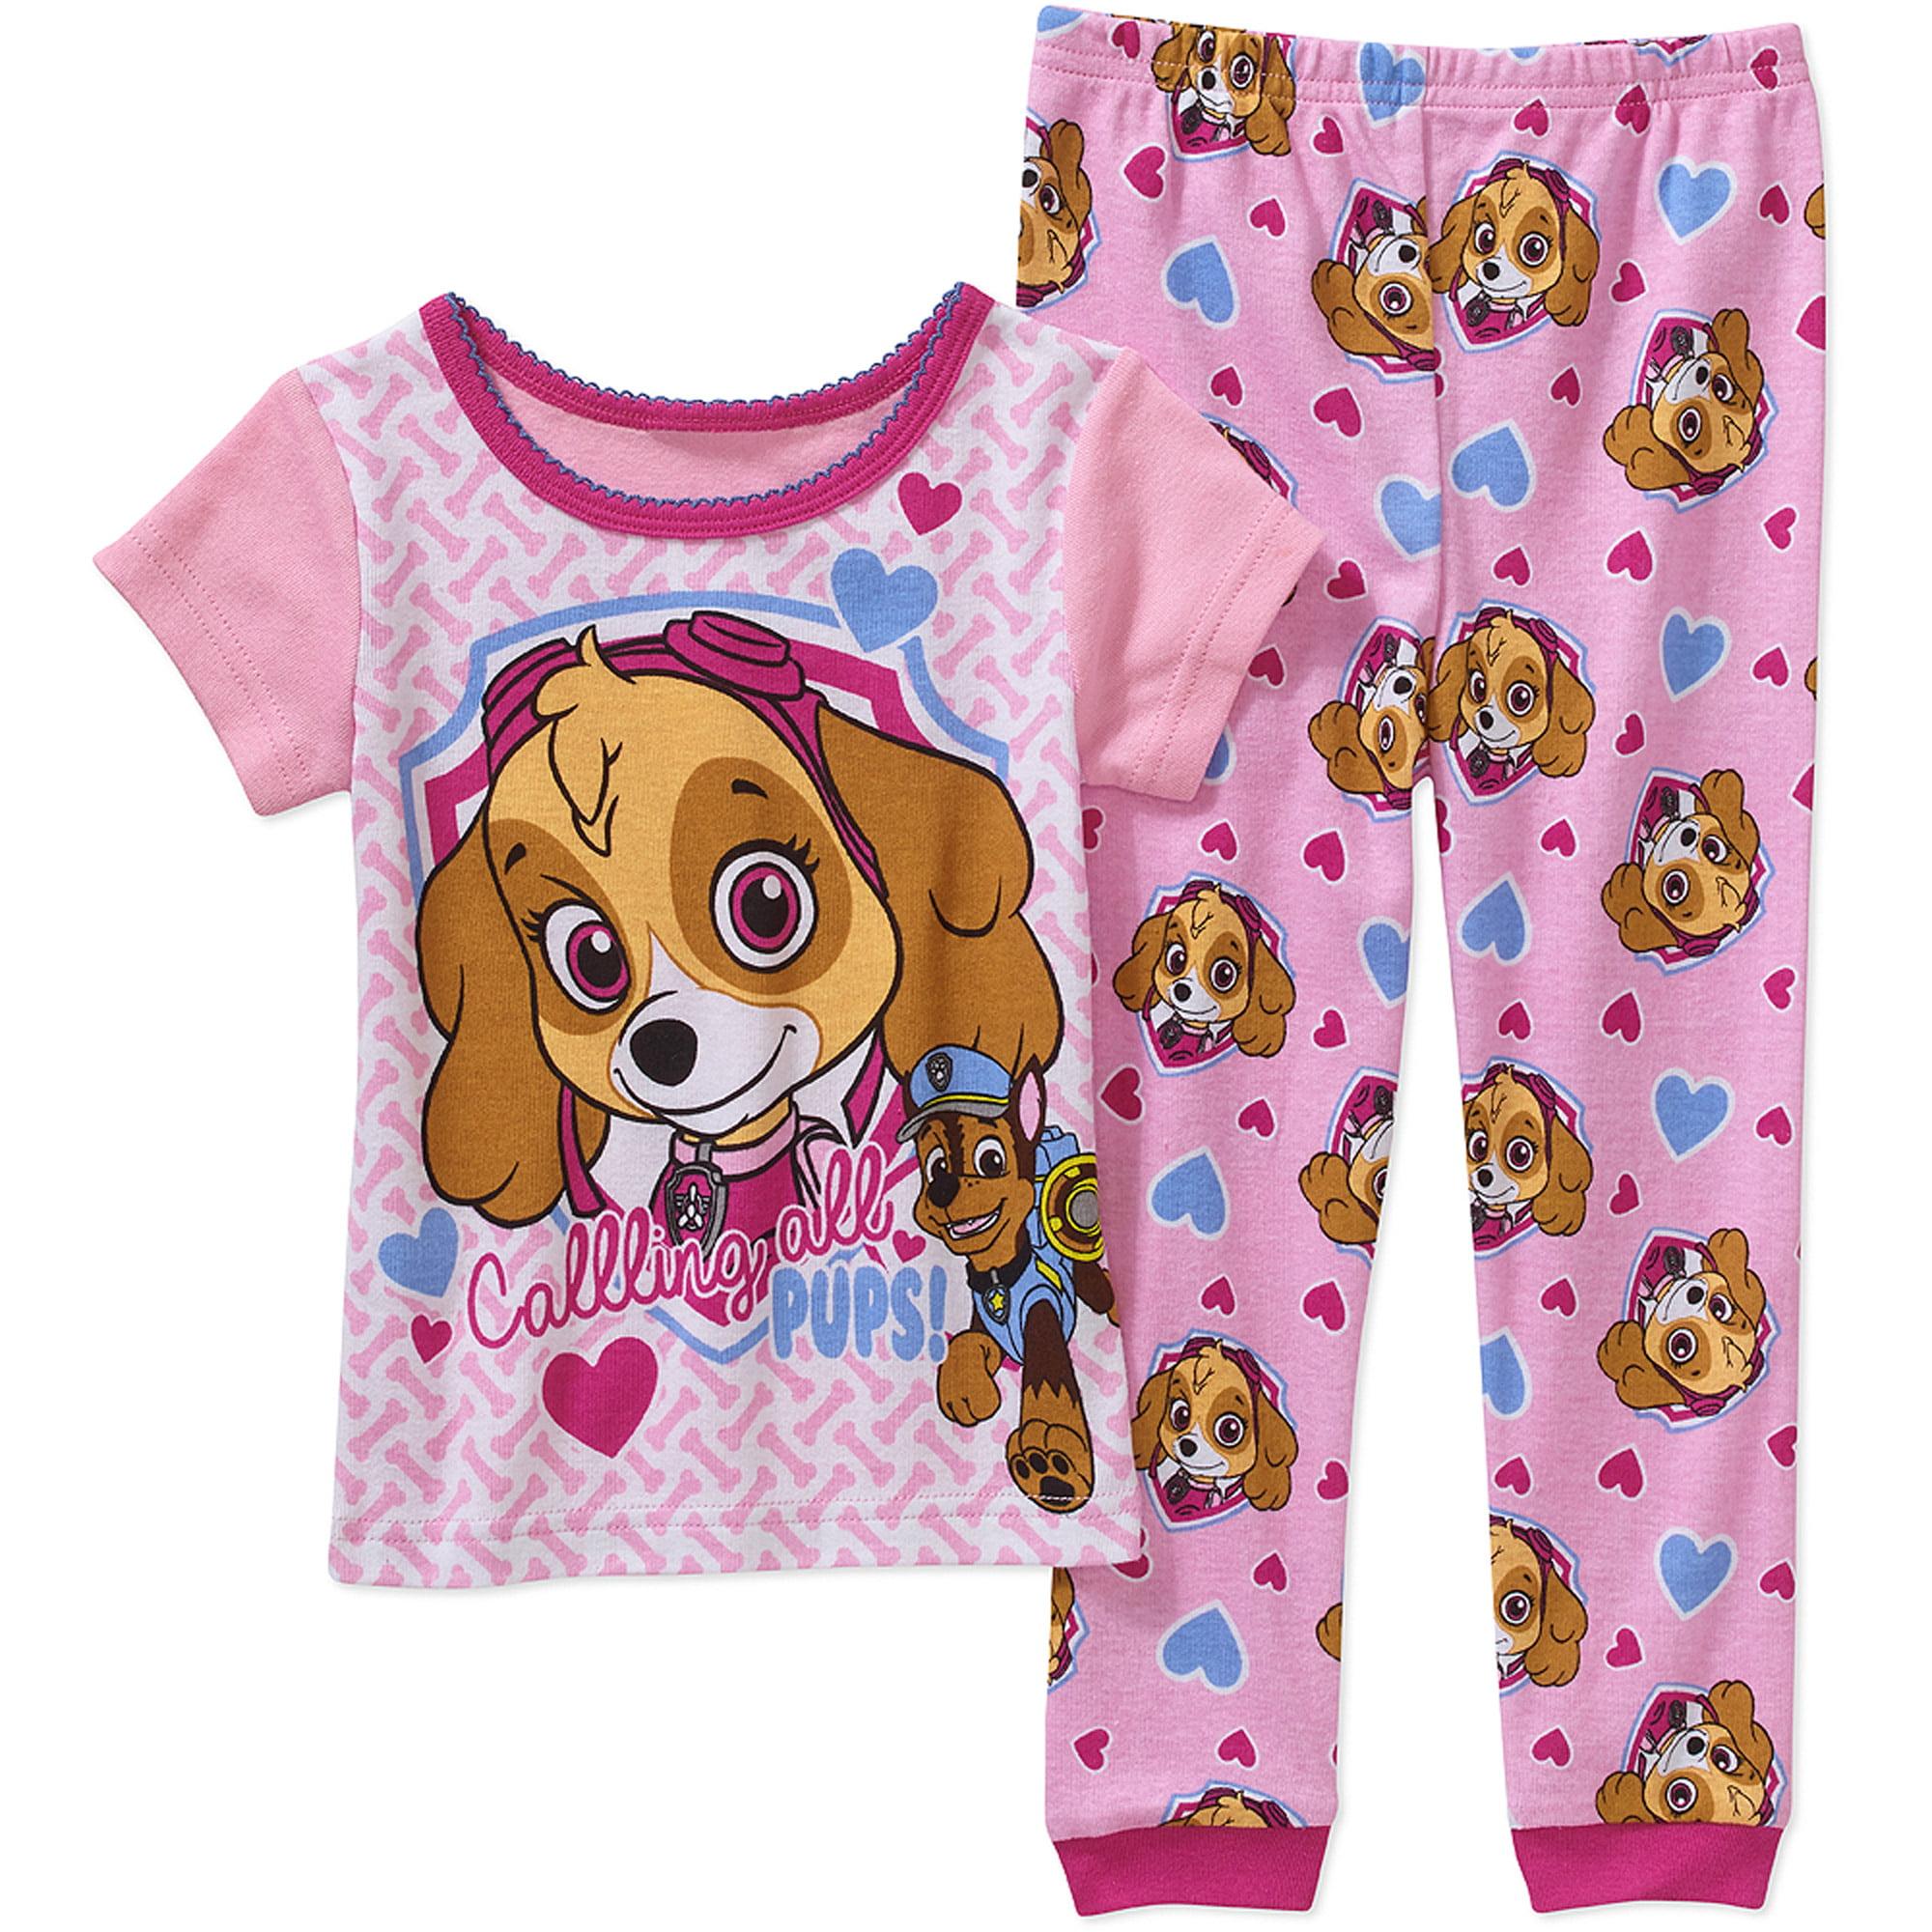 Paw Patrol It Girls Lic Sleepwear - Walmart.com